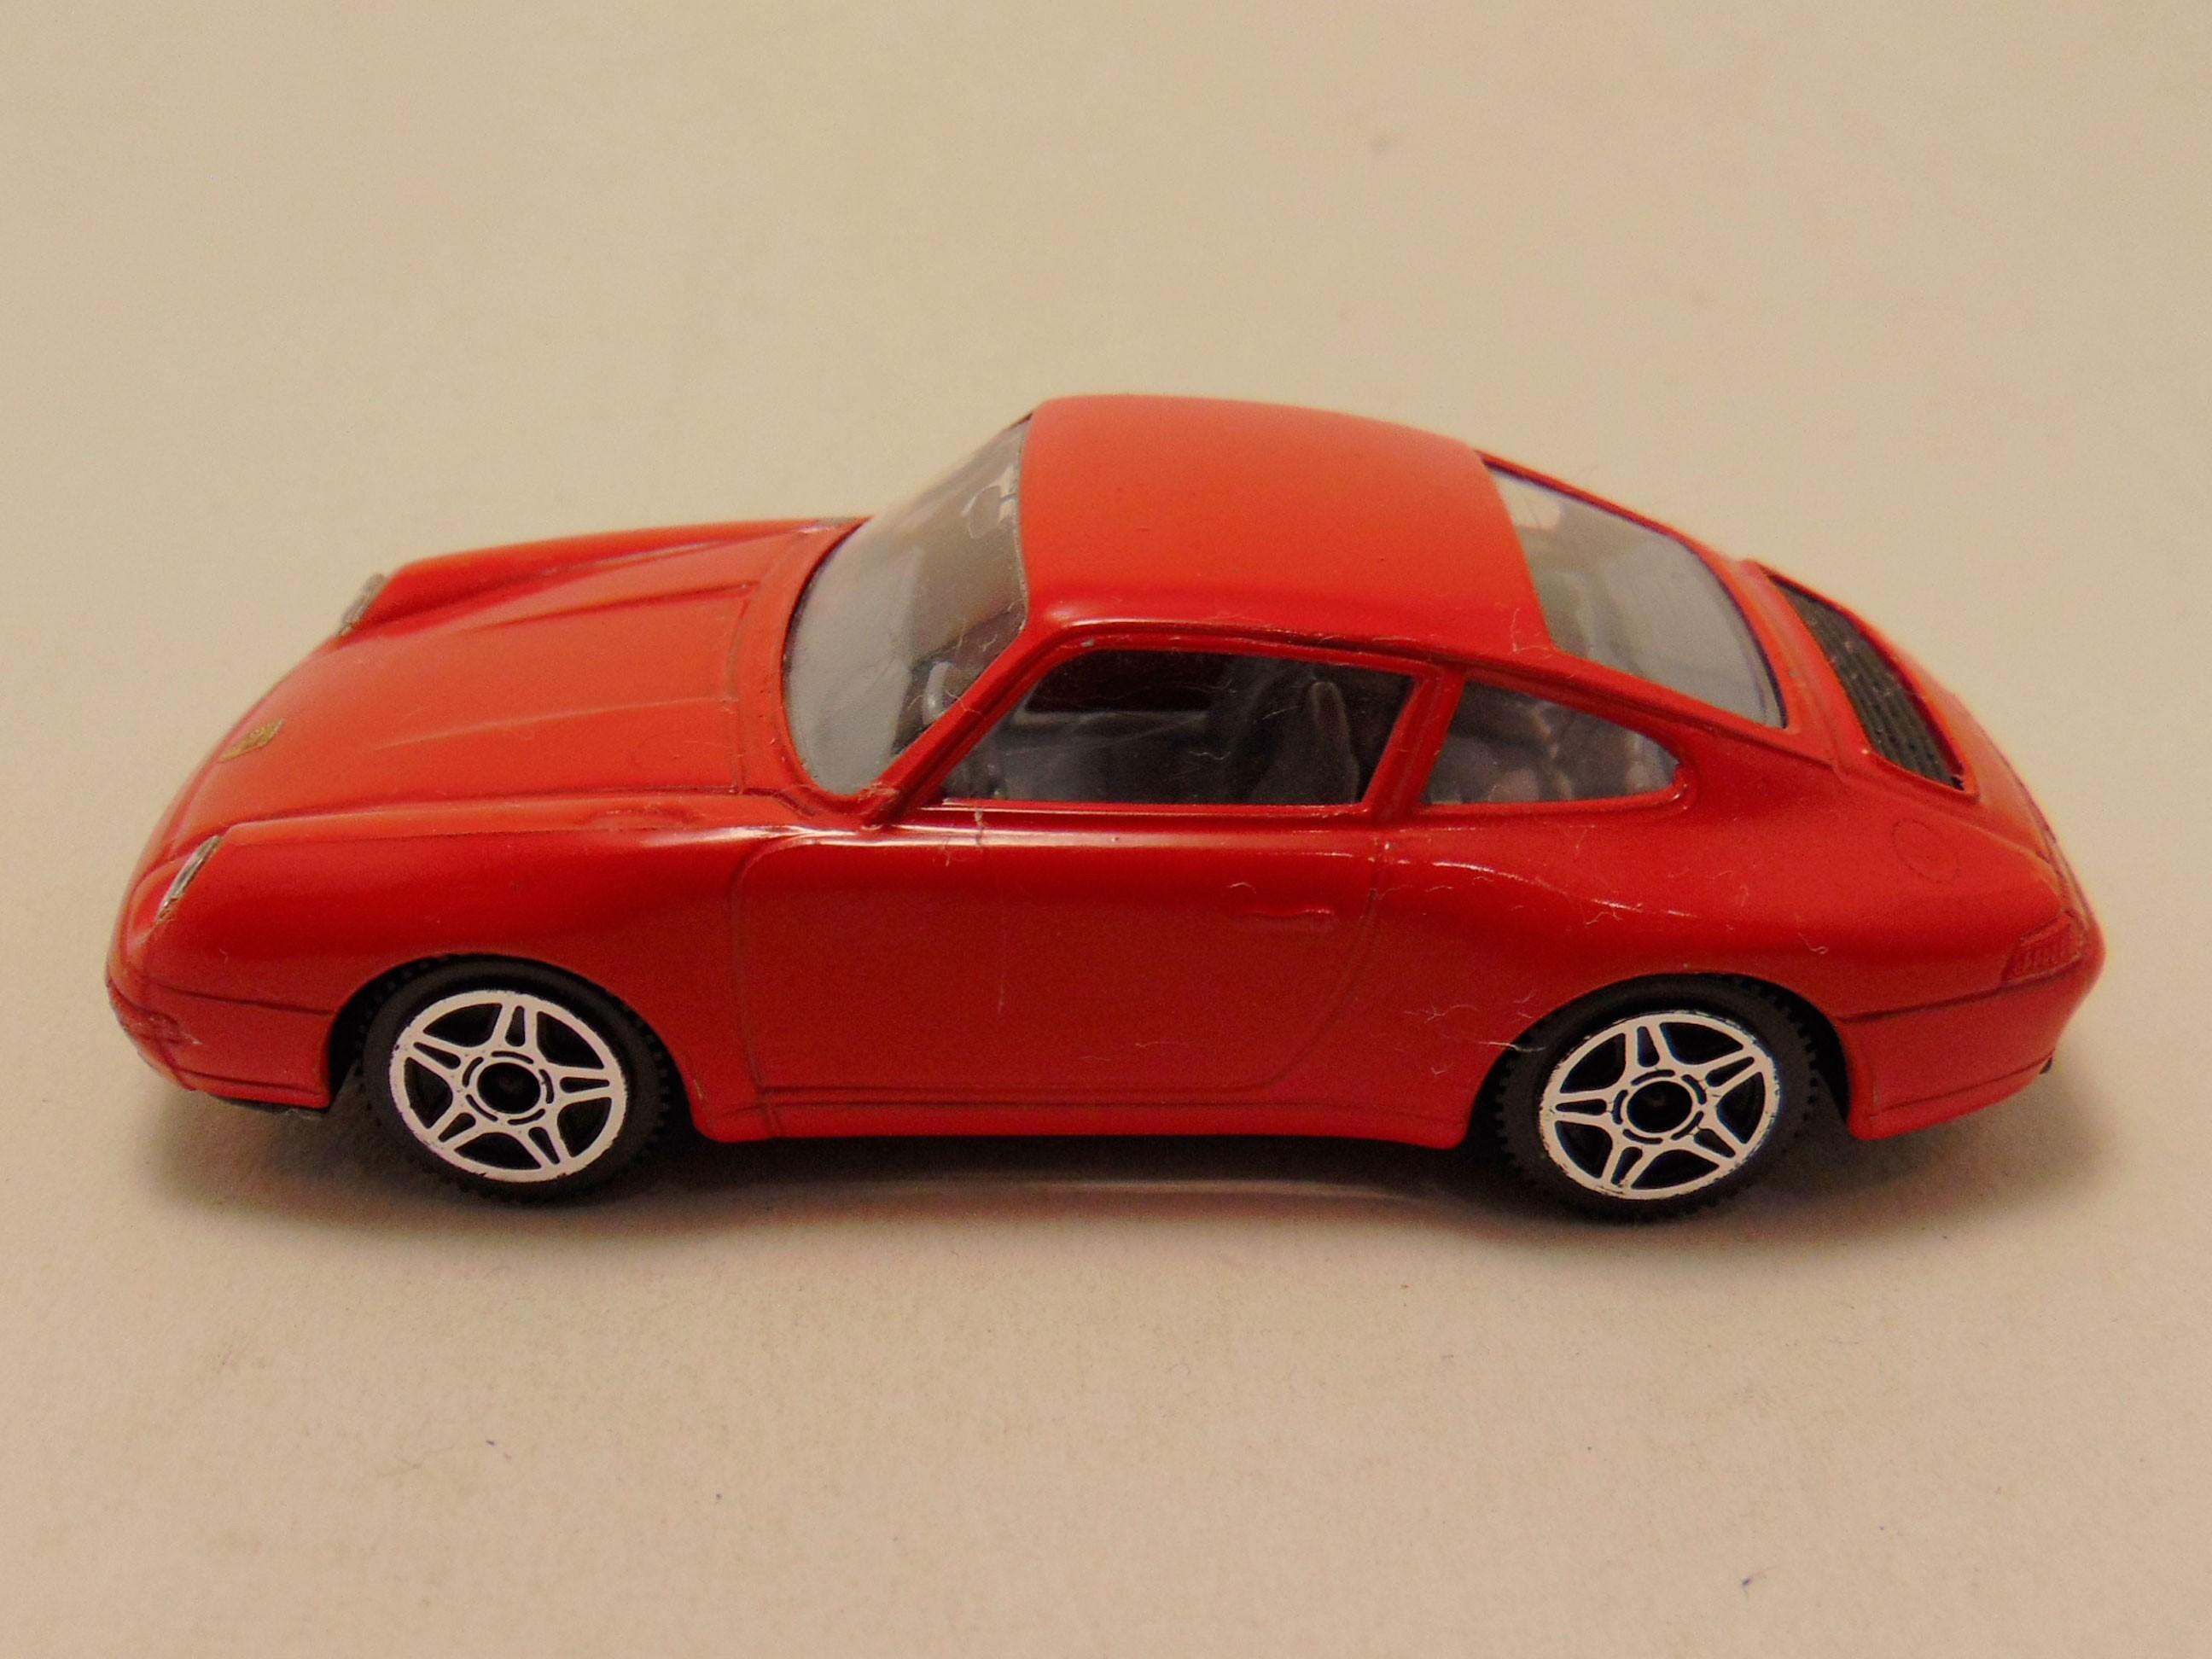 Chevrolet Corvette C4 Bburago 1:43 green